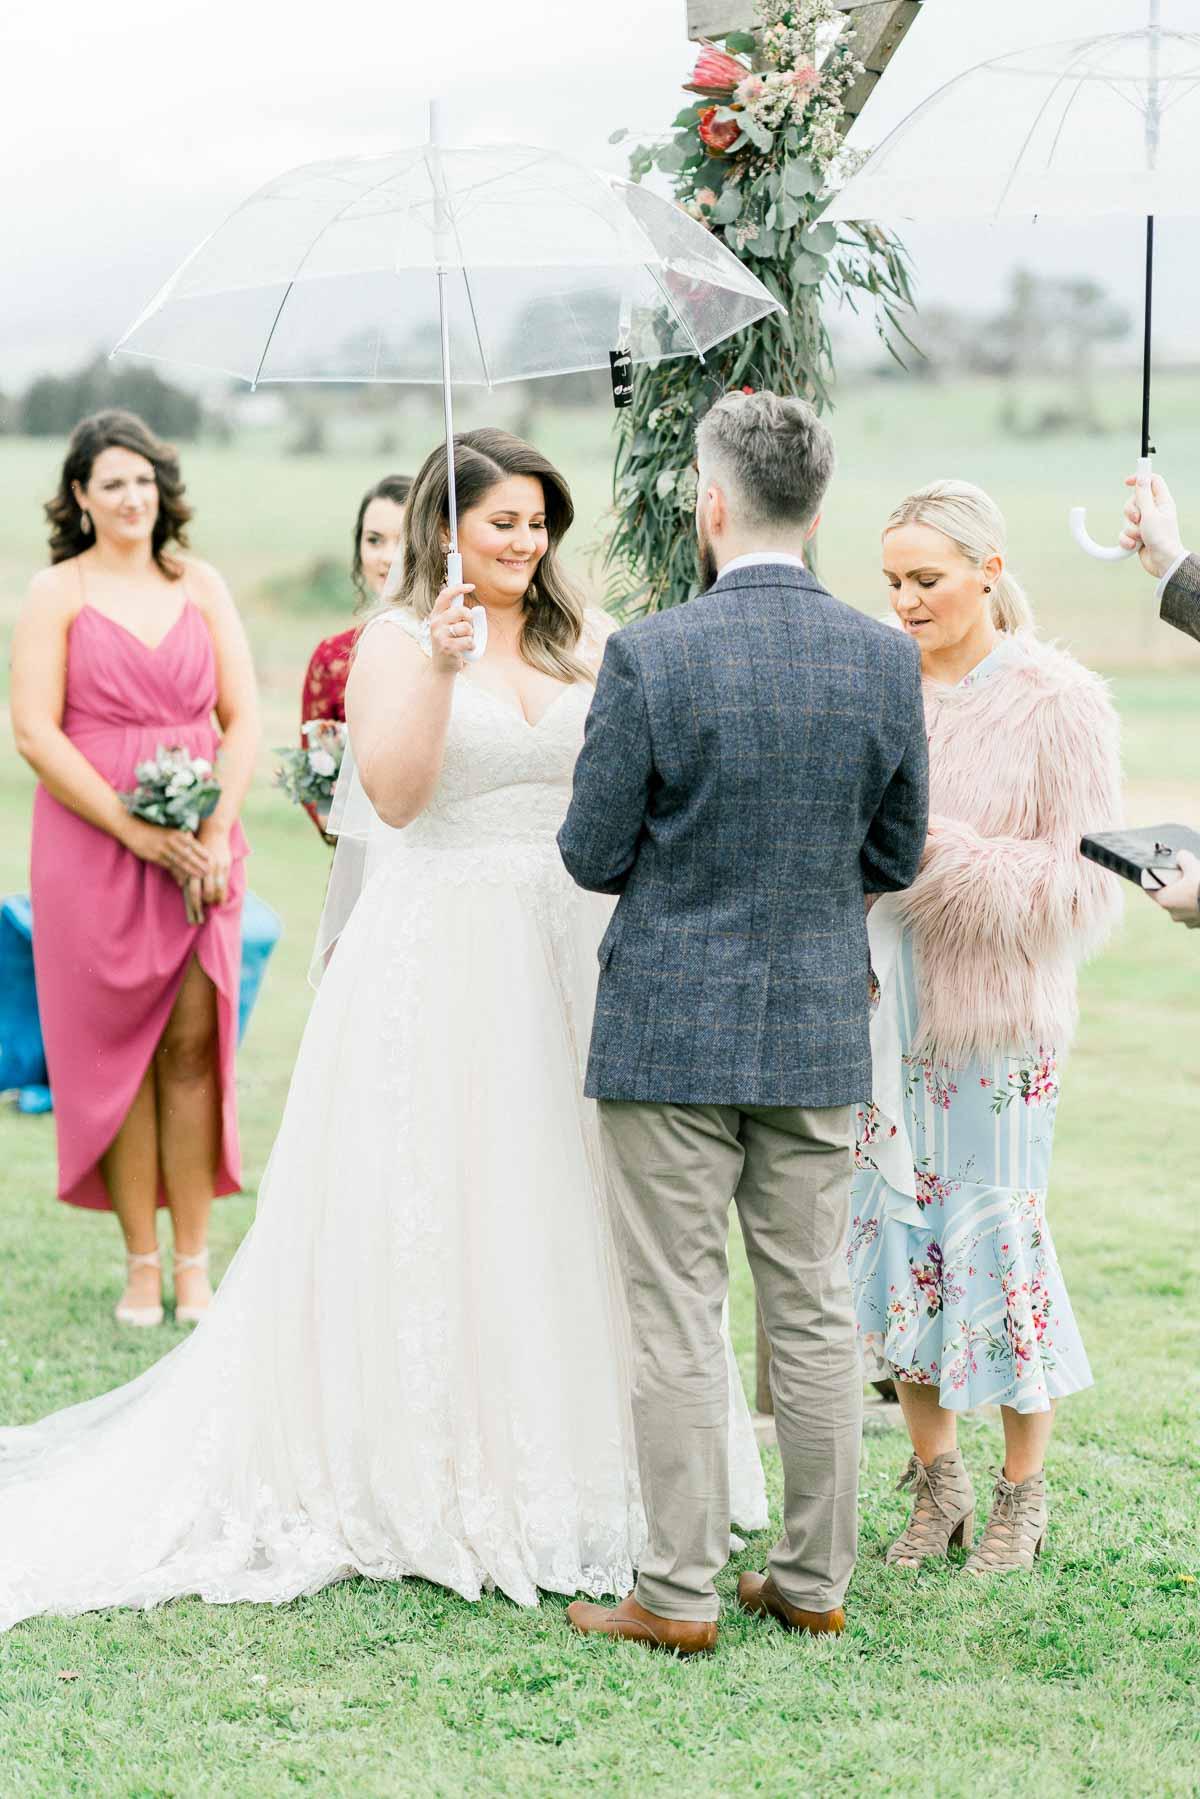 adams-farm-coldstream-yarra-valley-wedding-heart+soul-weddings-kel-jarryd-04979.jpg